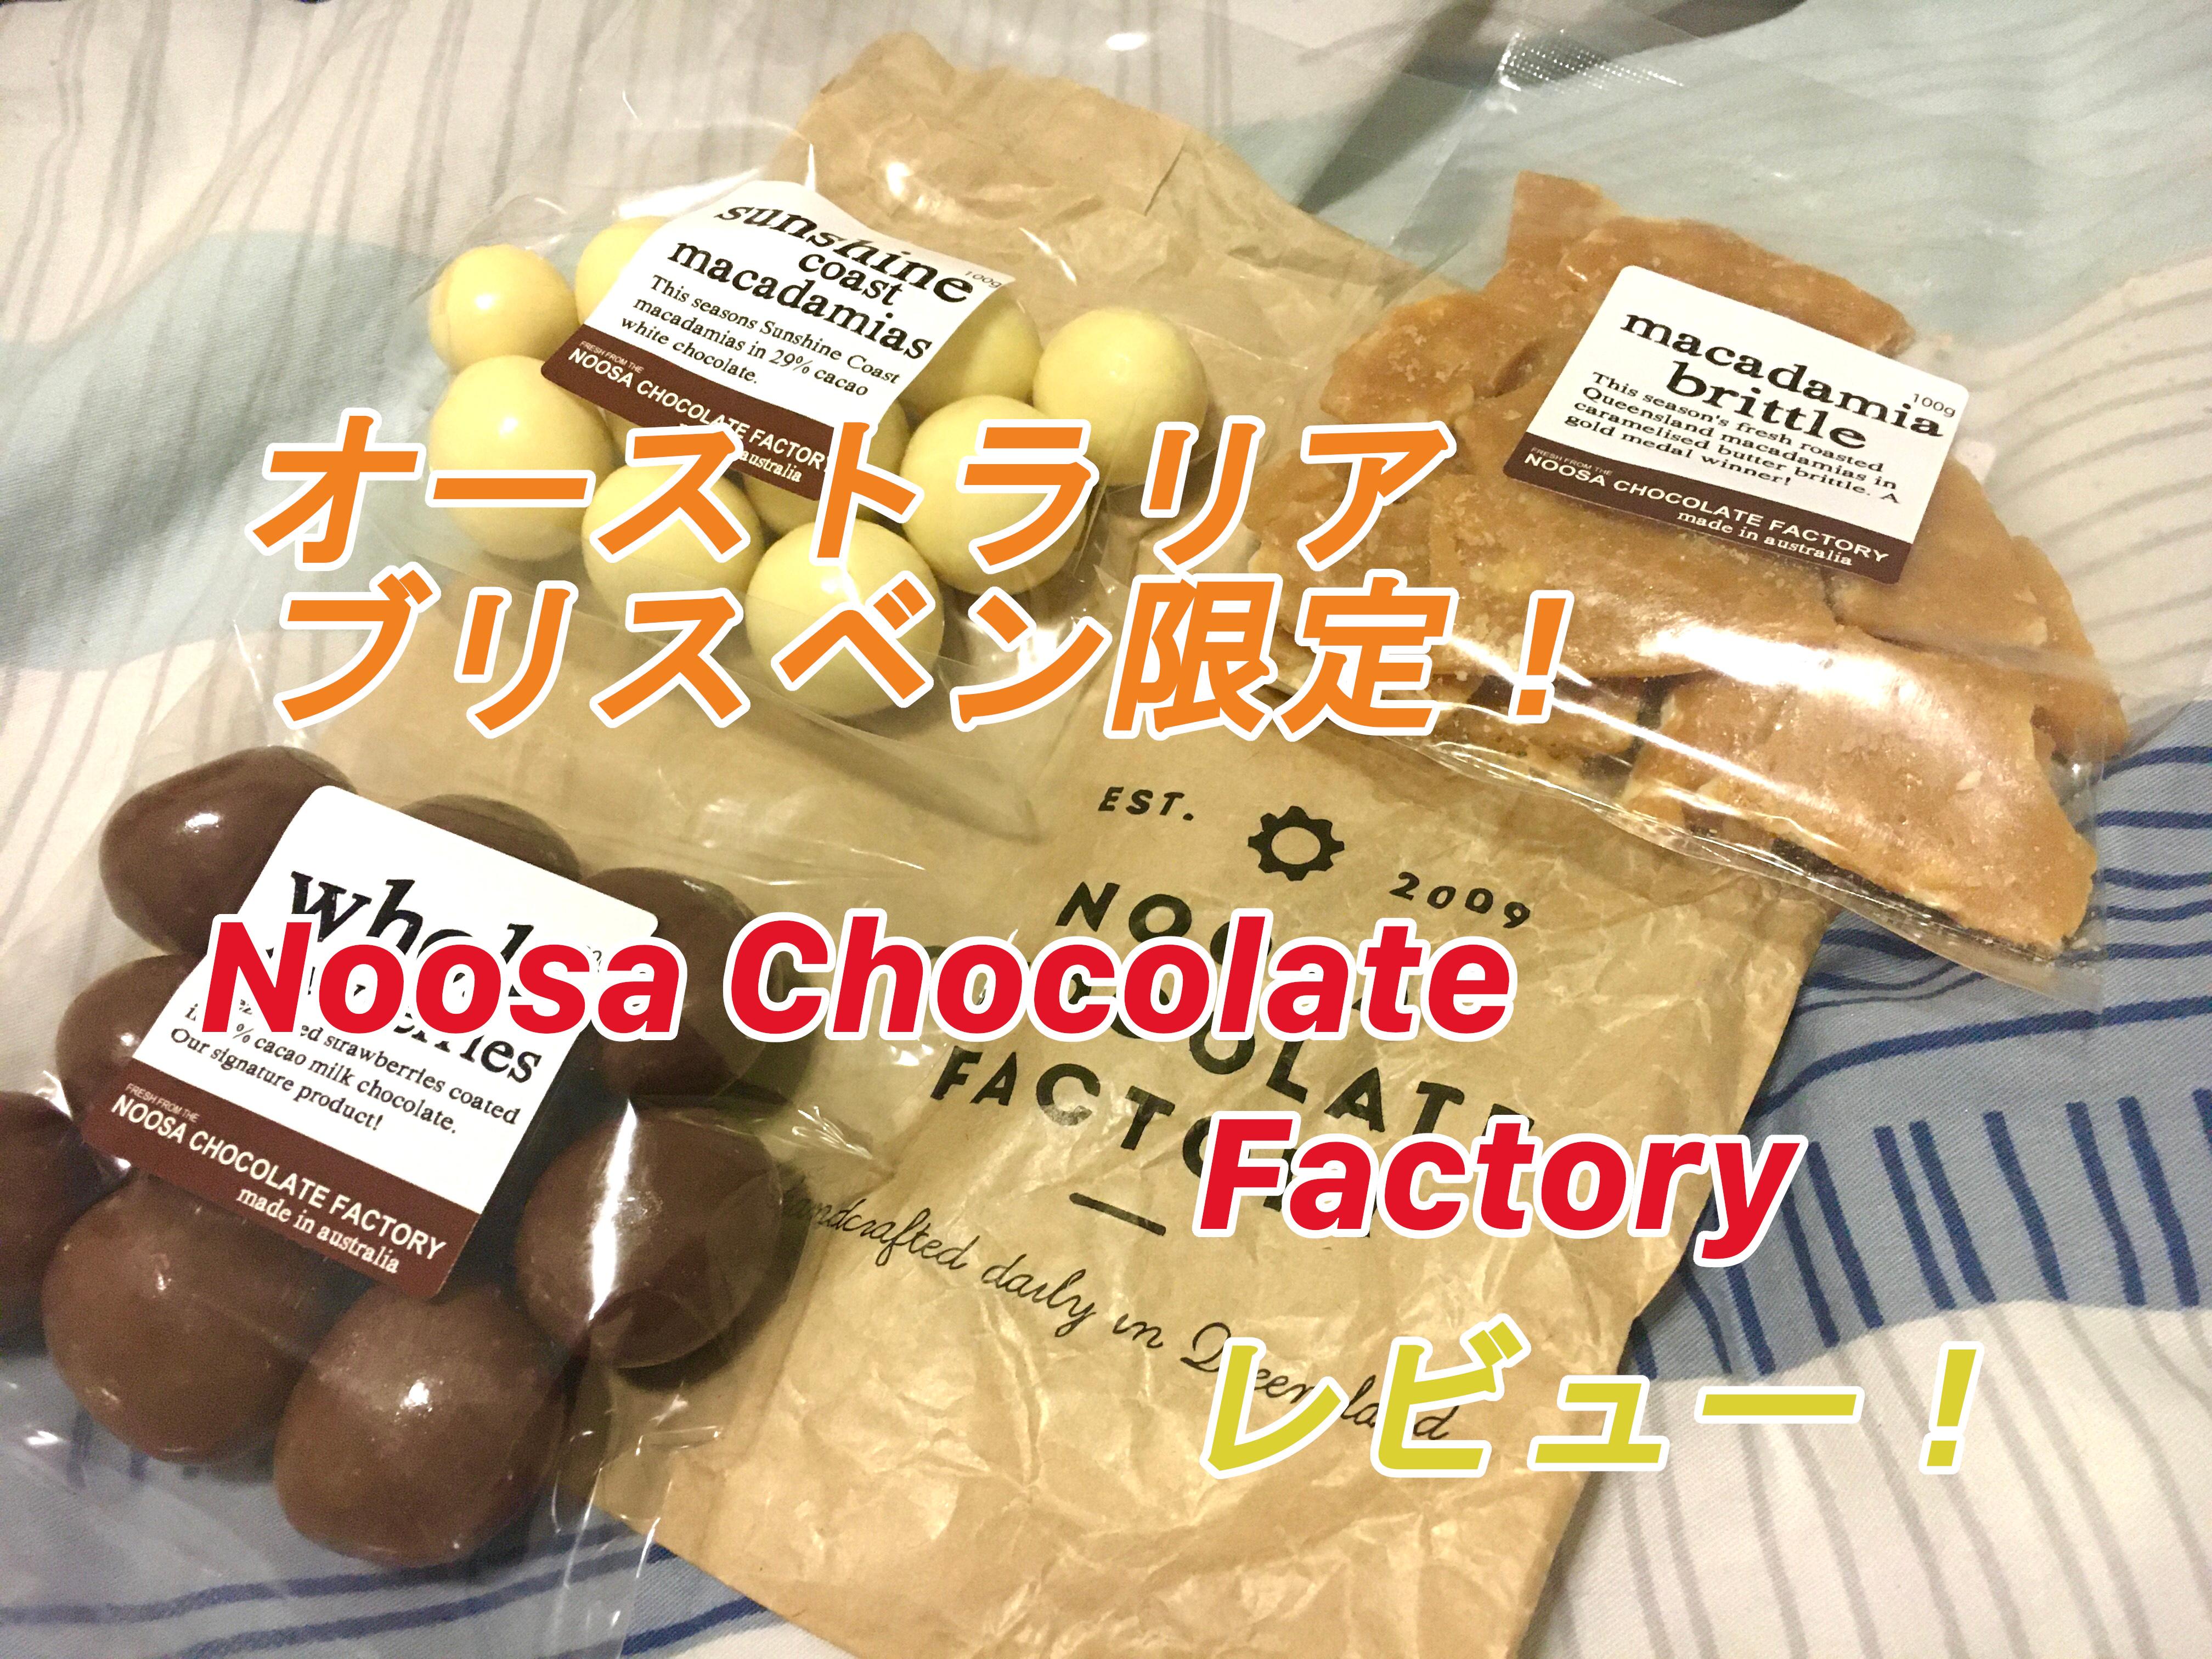 Noosa Chocolate Factoryレビュー!